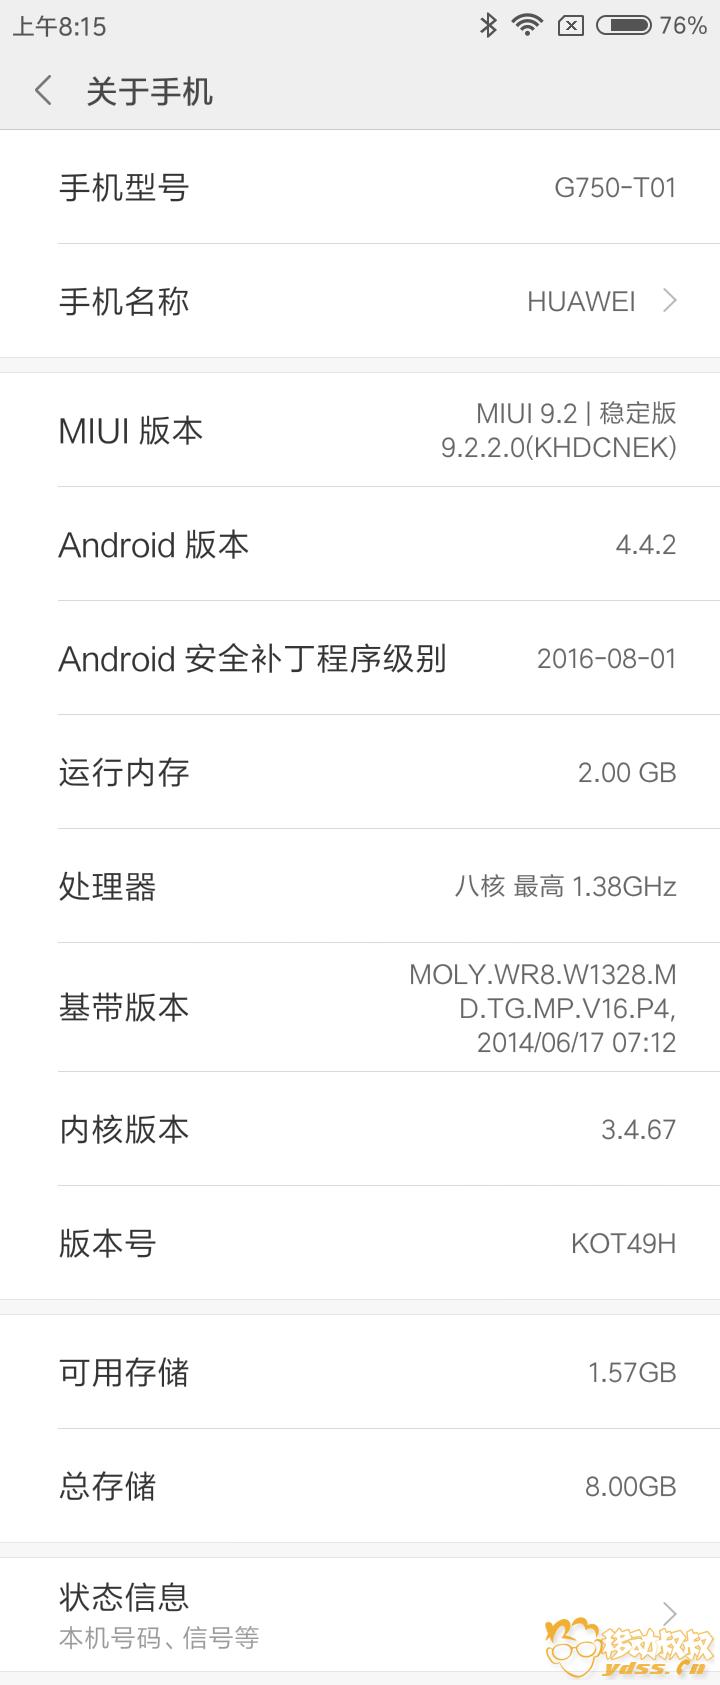 Screenshot_2018-01-17-08-15-51-994_com.android.settings.png